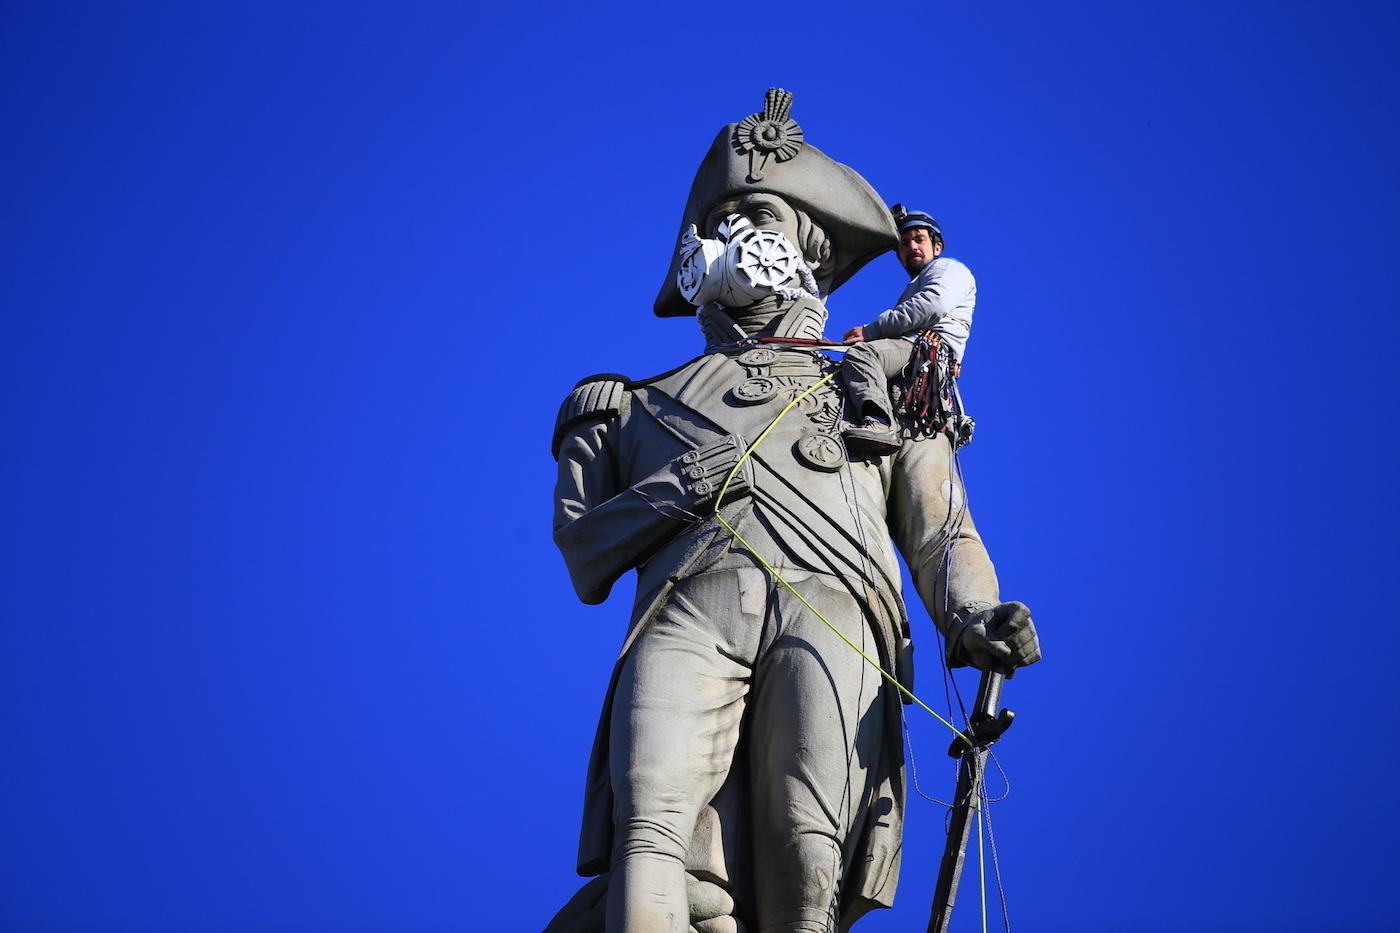 Luke Jones of Greenpeace climbing Nelson's Column at Trafalgar Square (photo by Jiri Rezac)